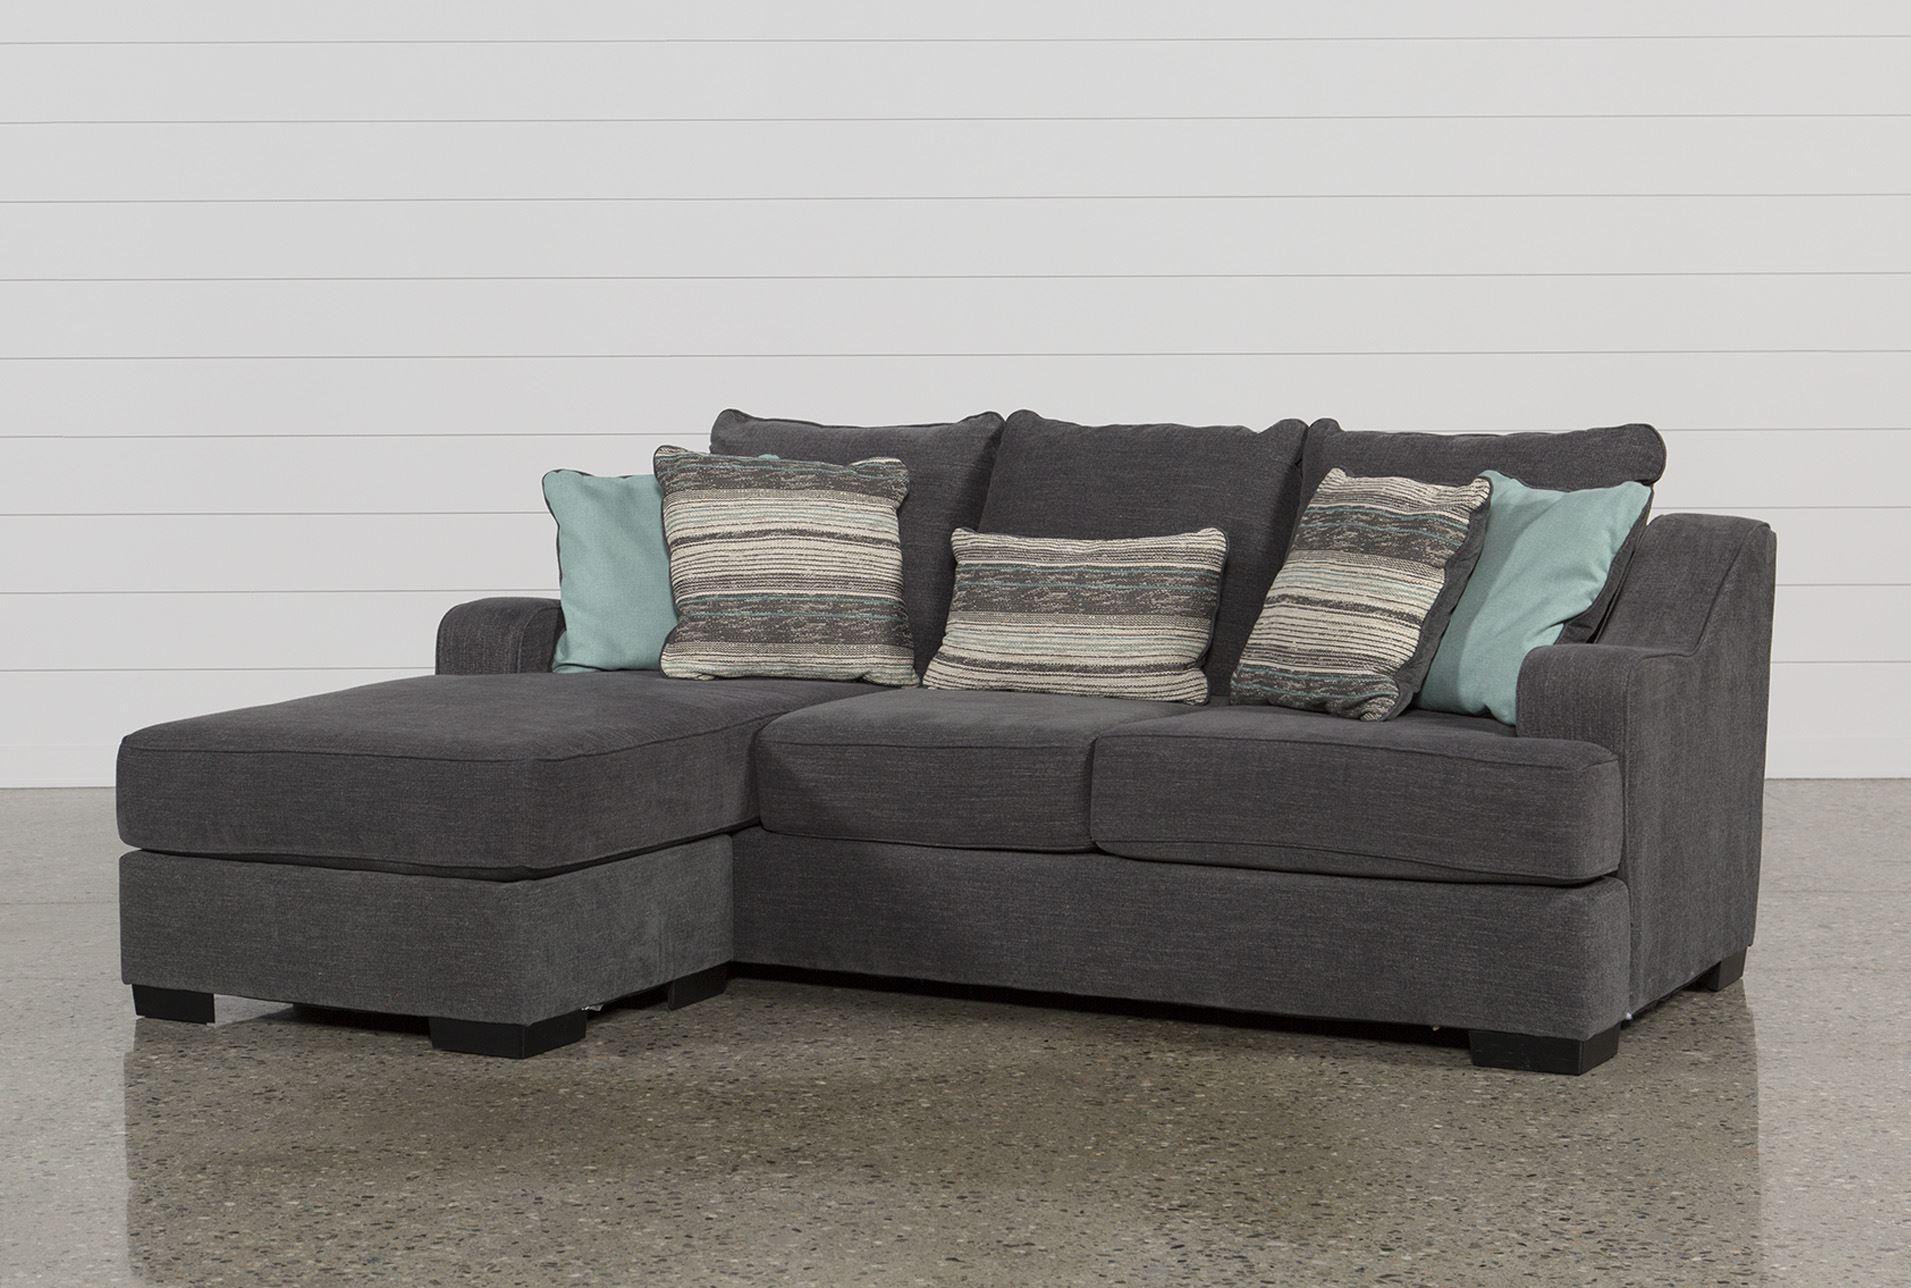 Furniture: Using Comfy Simmons Sleeper Sofa For Home Furniture For Simmons Chaise Sofa (View 10 of 20)